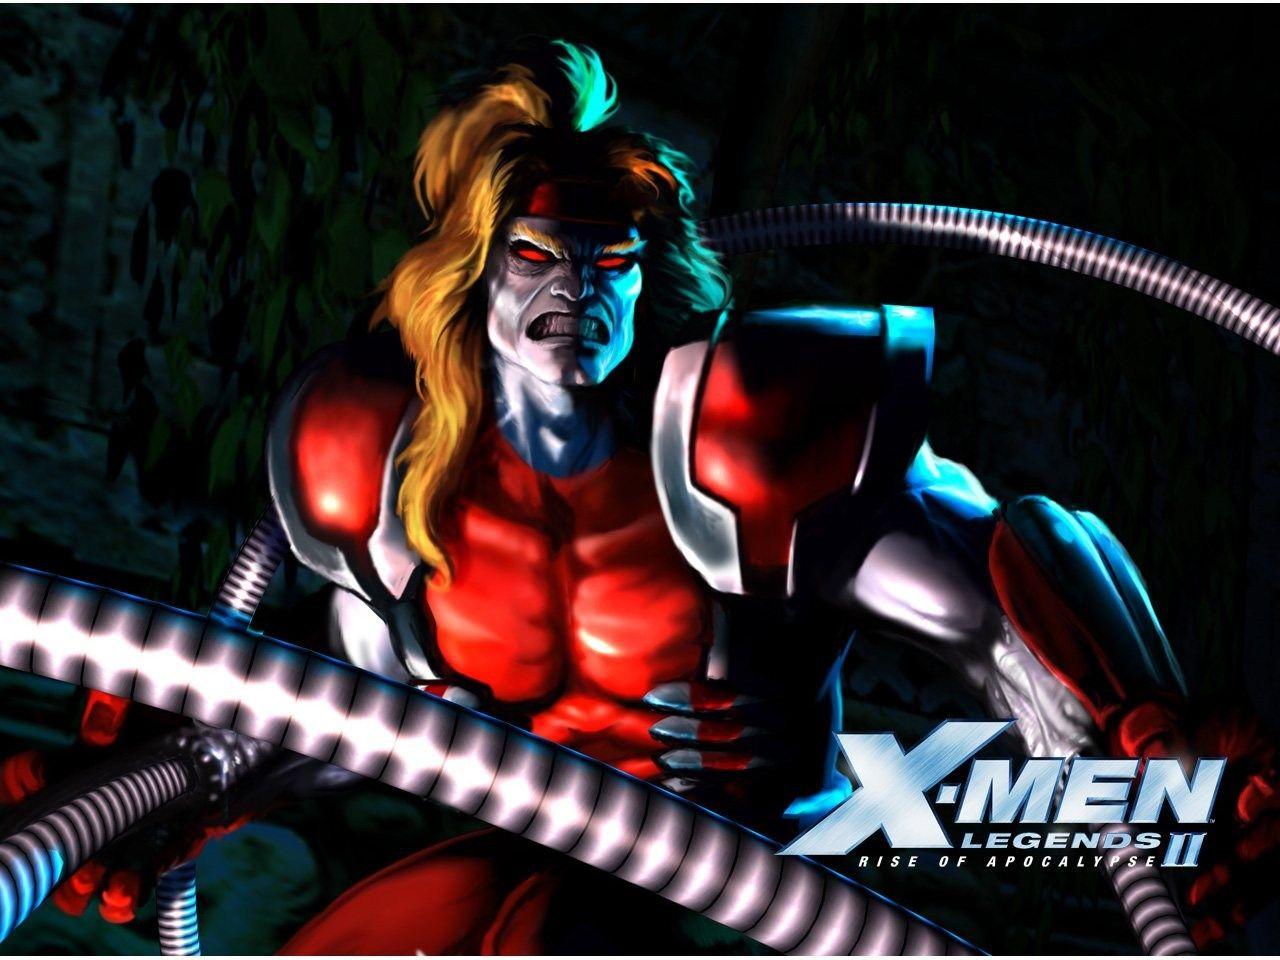 X Men Legends Ii Rise Of Apocalypse Wallpaper Collection Wallpapers Super Herois Super Heroi Herois